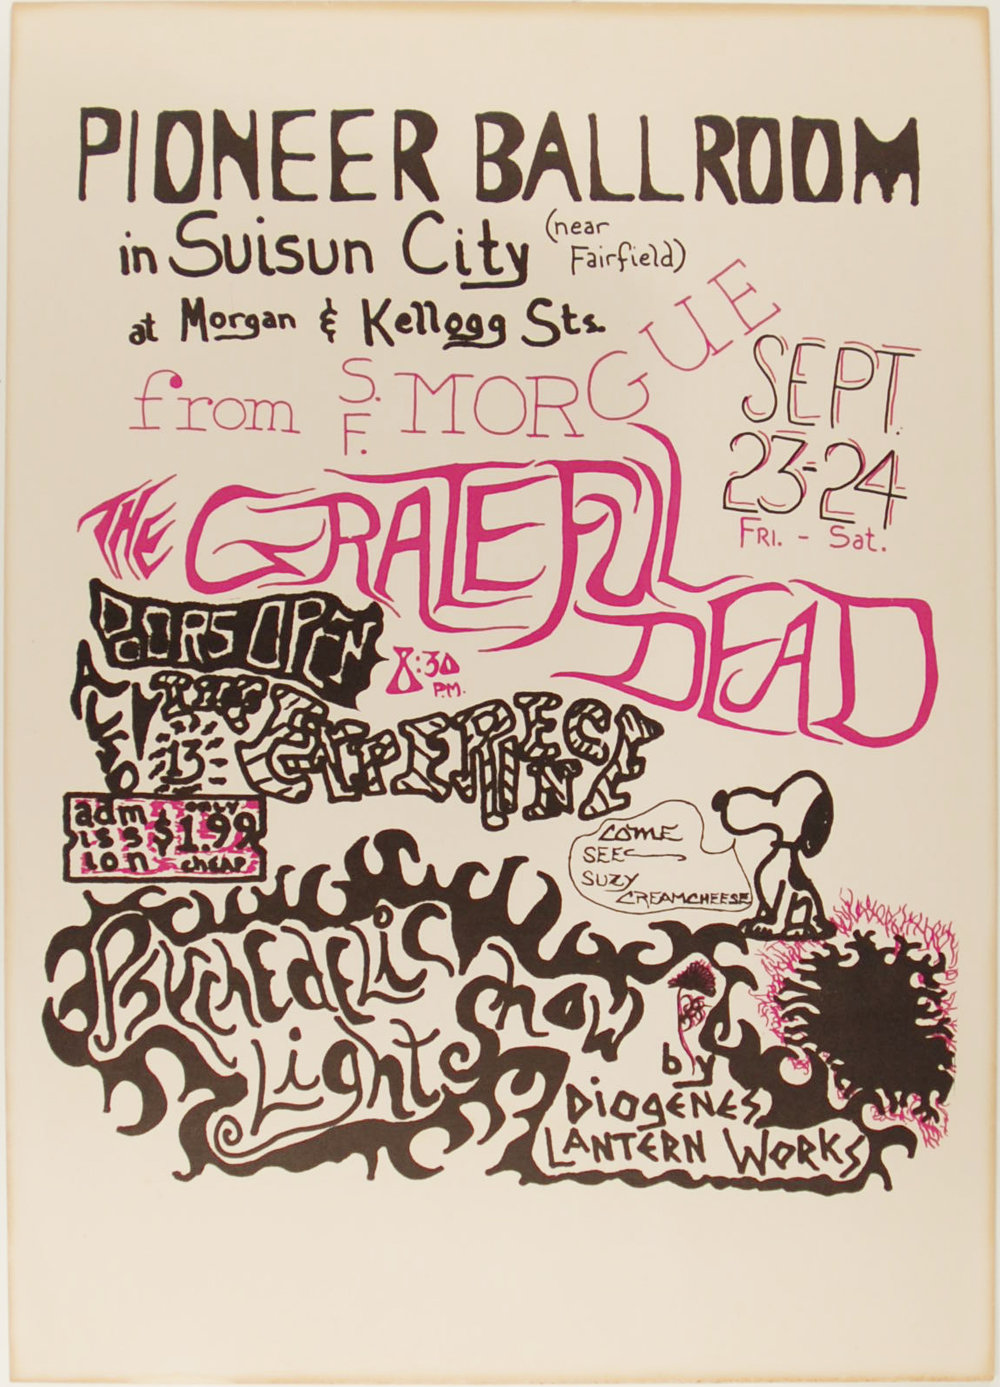 Grateful Dead, Pioneer Ballroom